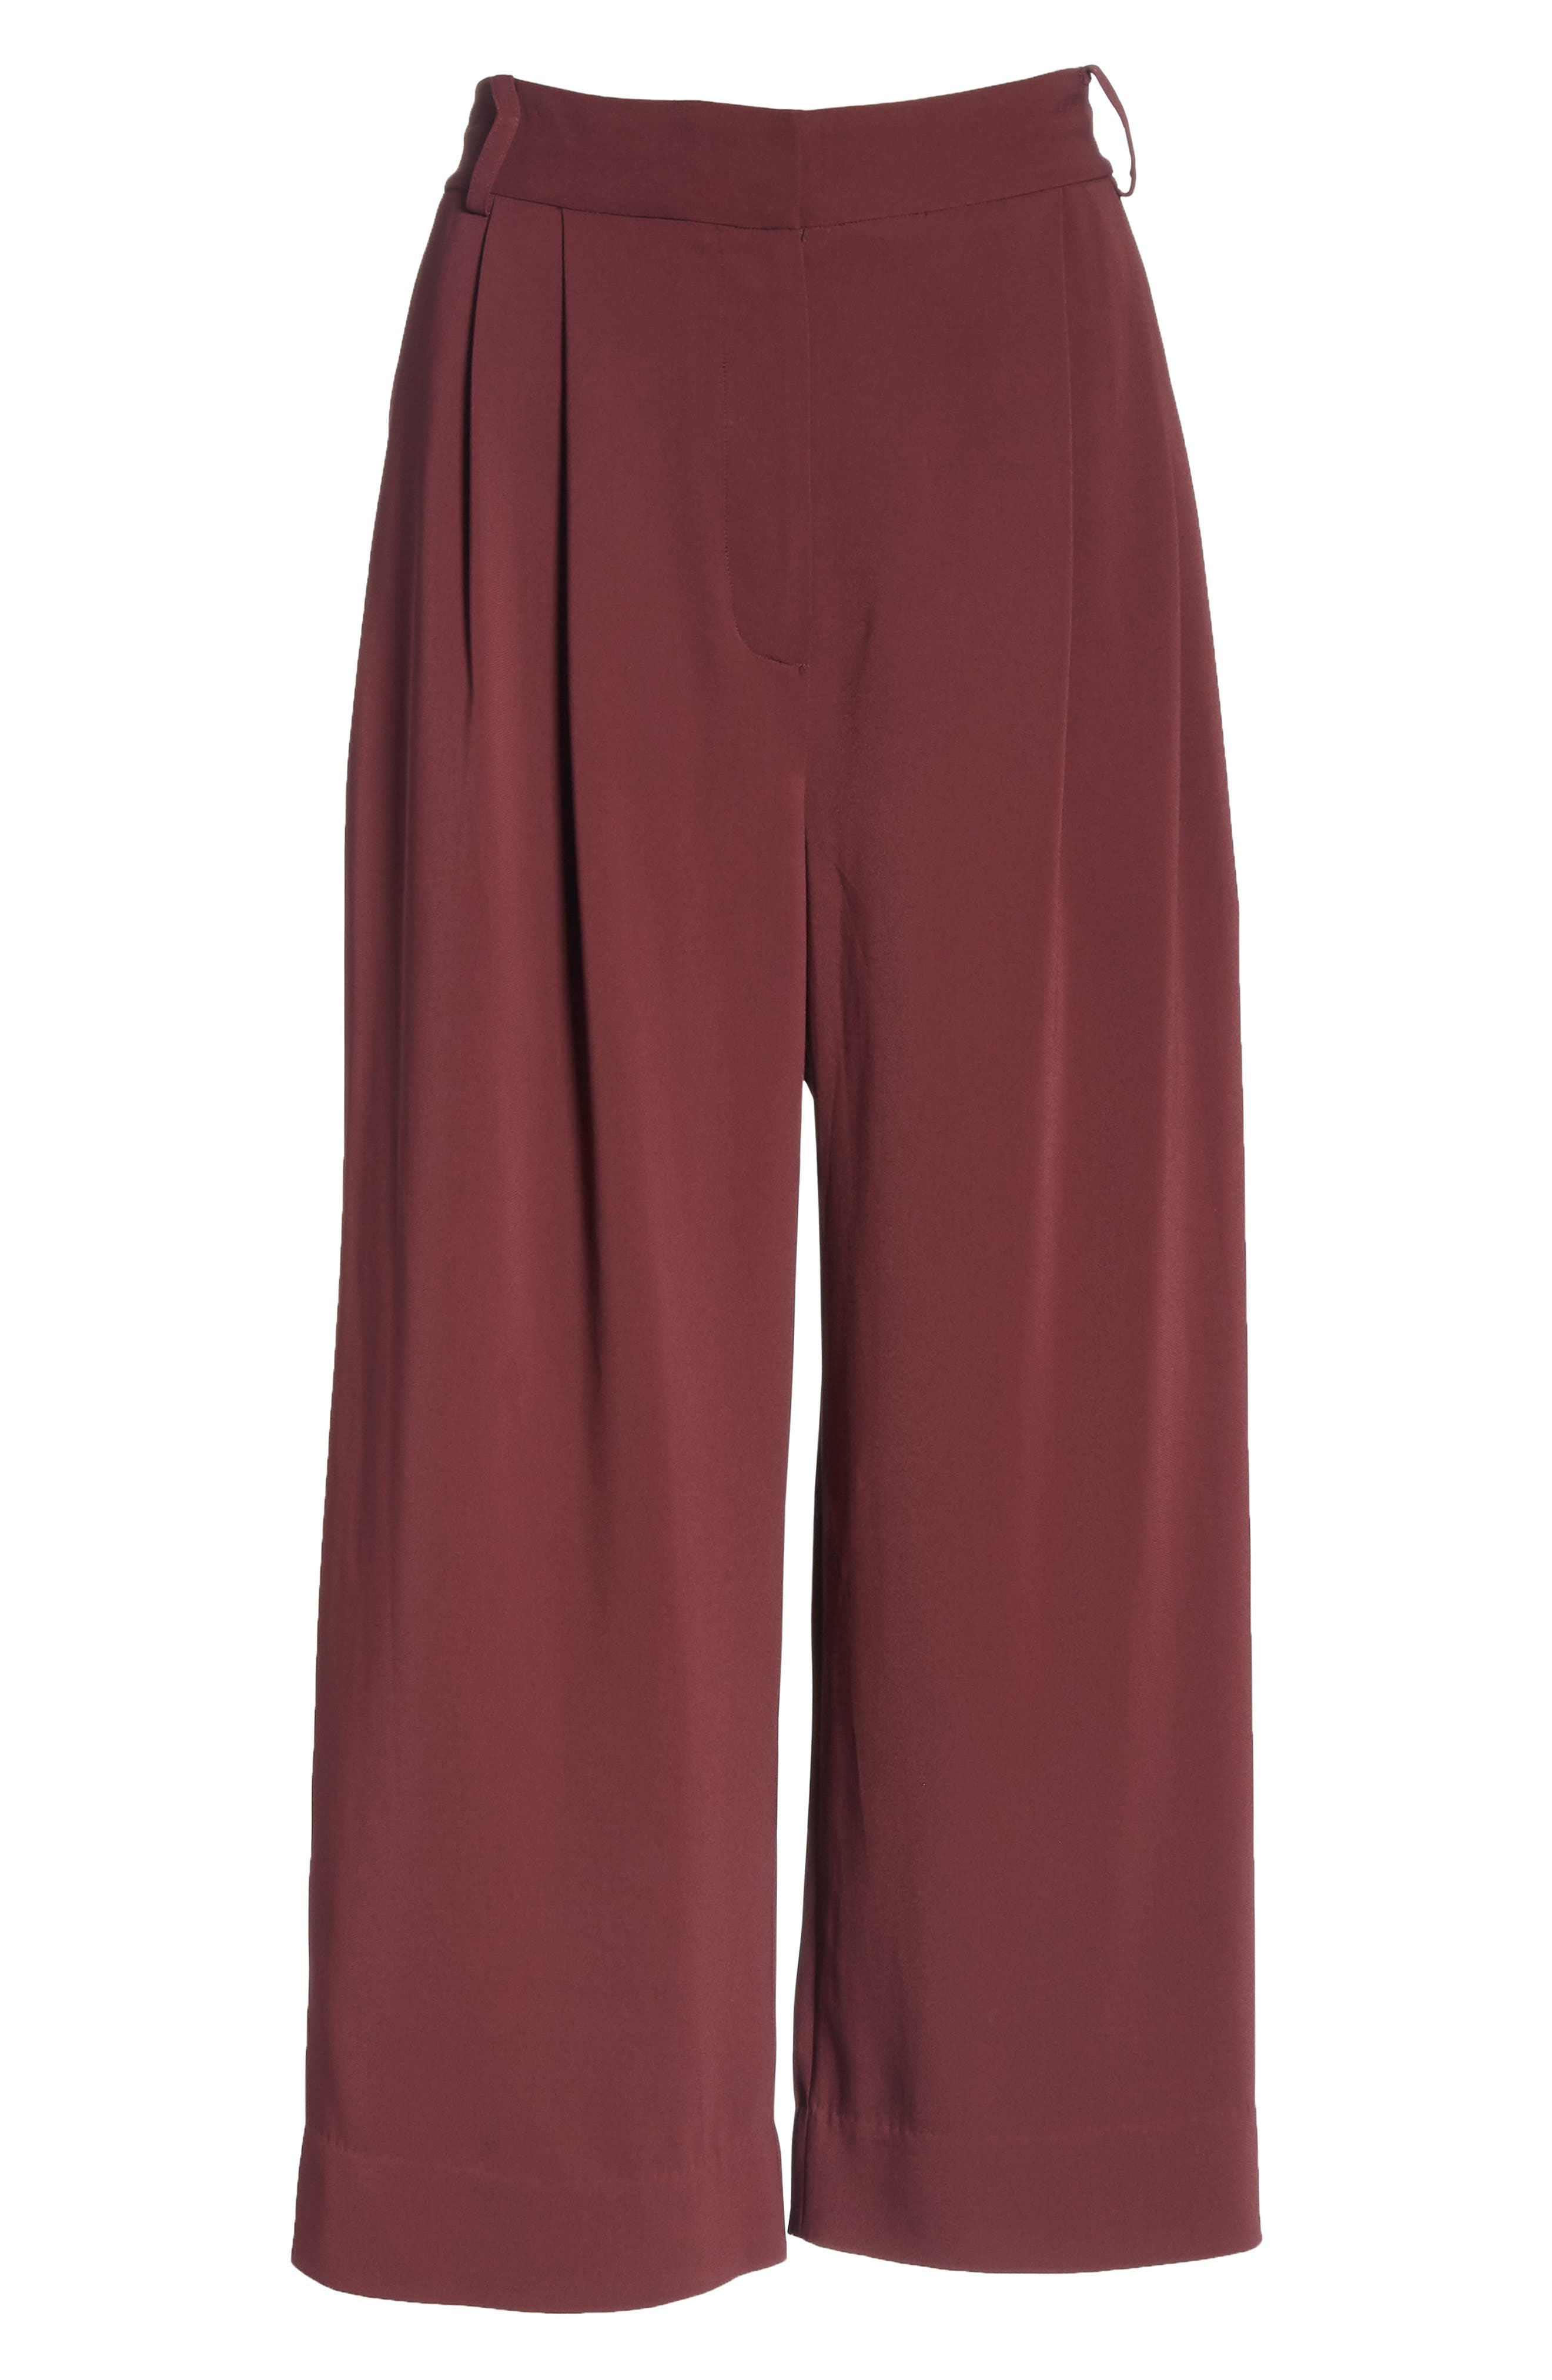 TIBI,                             Stella Stretch Suiting Crop Pants,                             Alternate thumbnail 7, color,                             DARK CURRANT